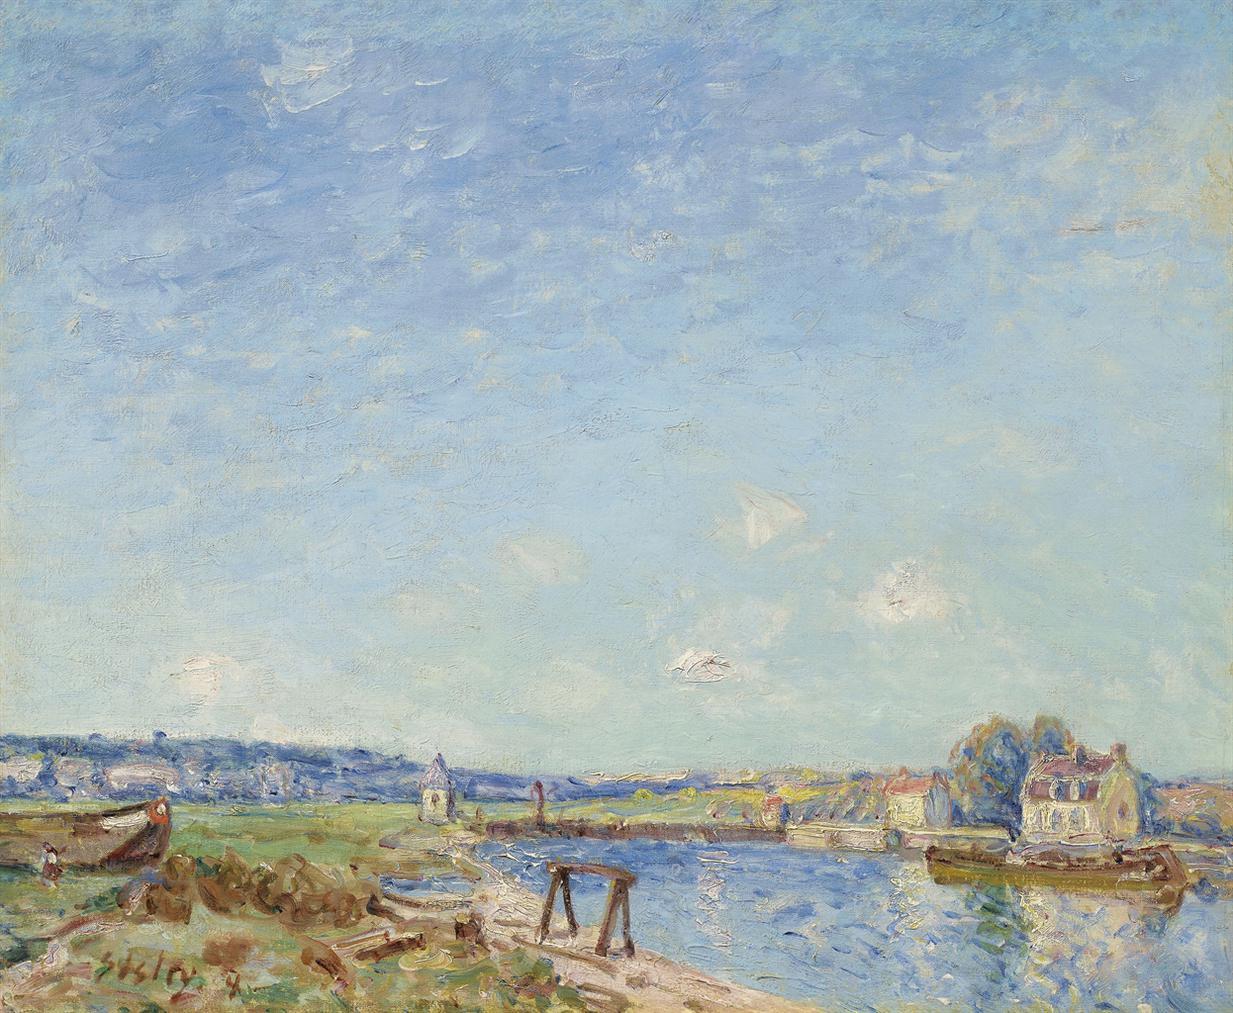 Alfred Sisley-Le Loing A Saint-Mammes-1884